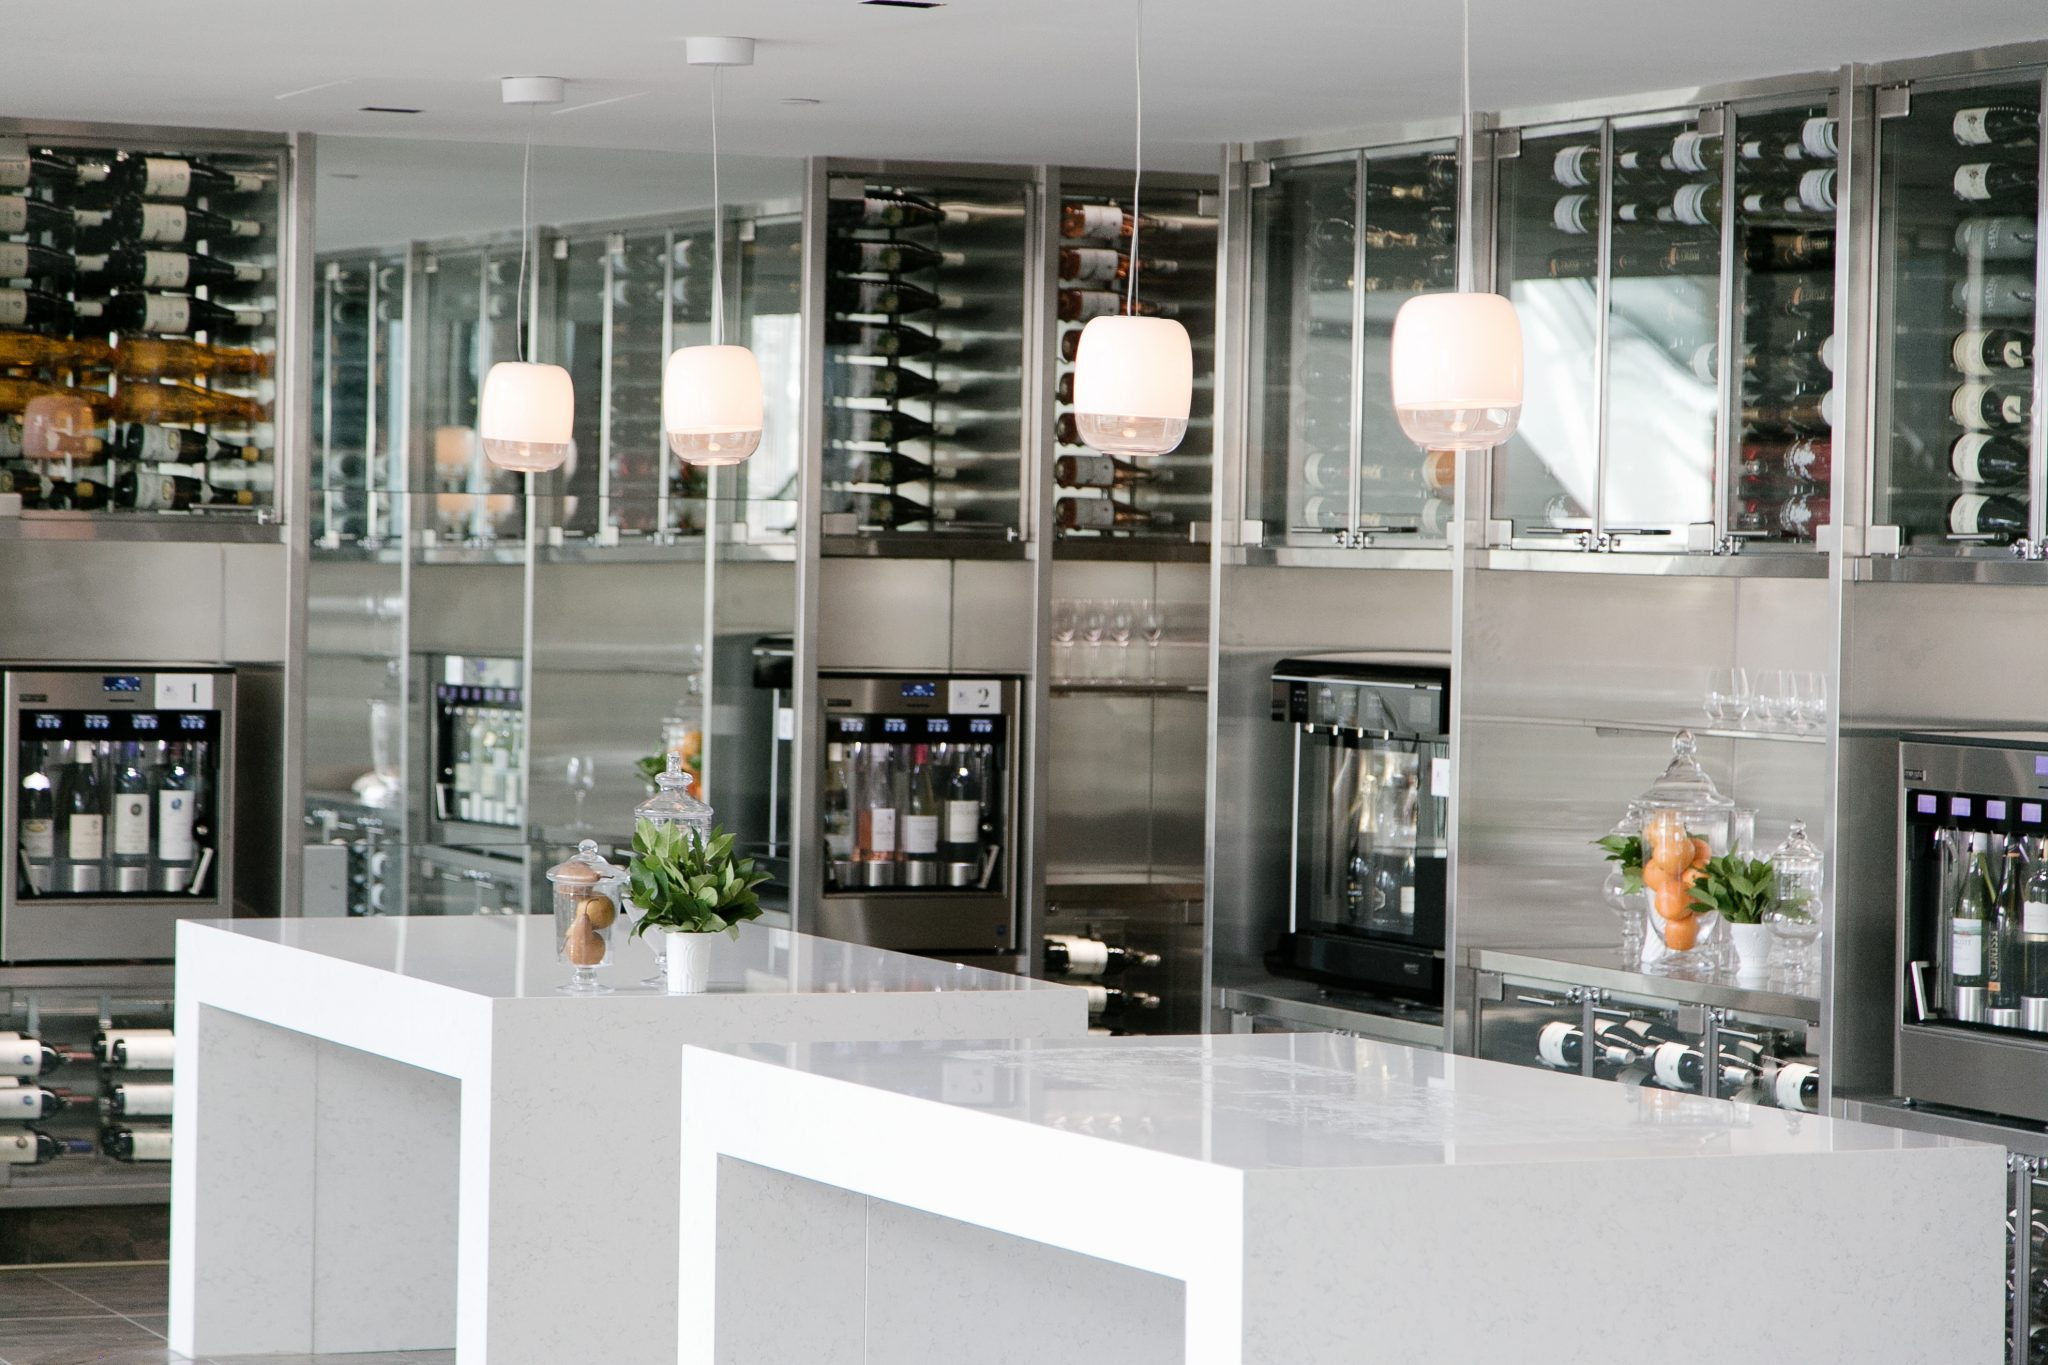 Varia wine studio